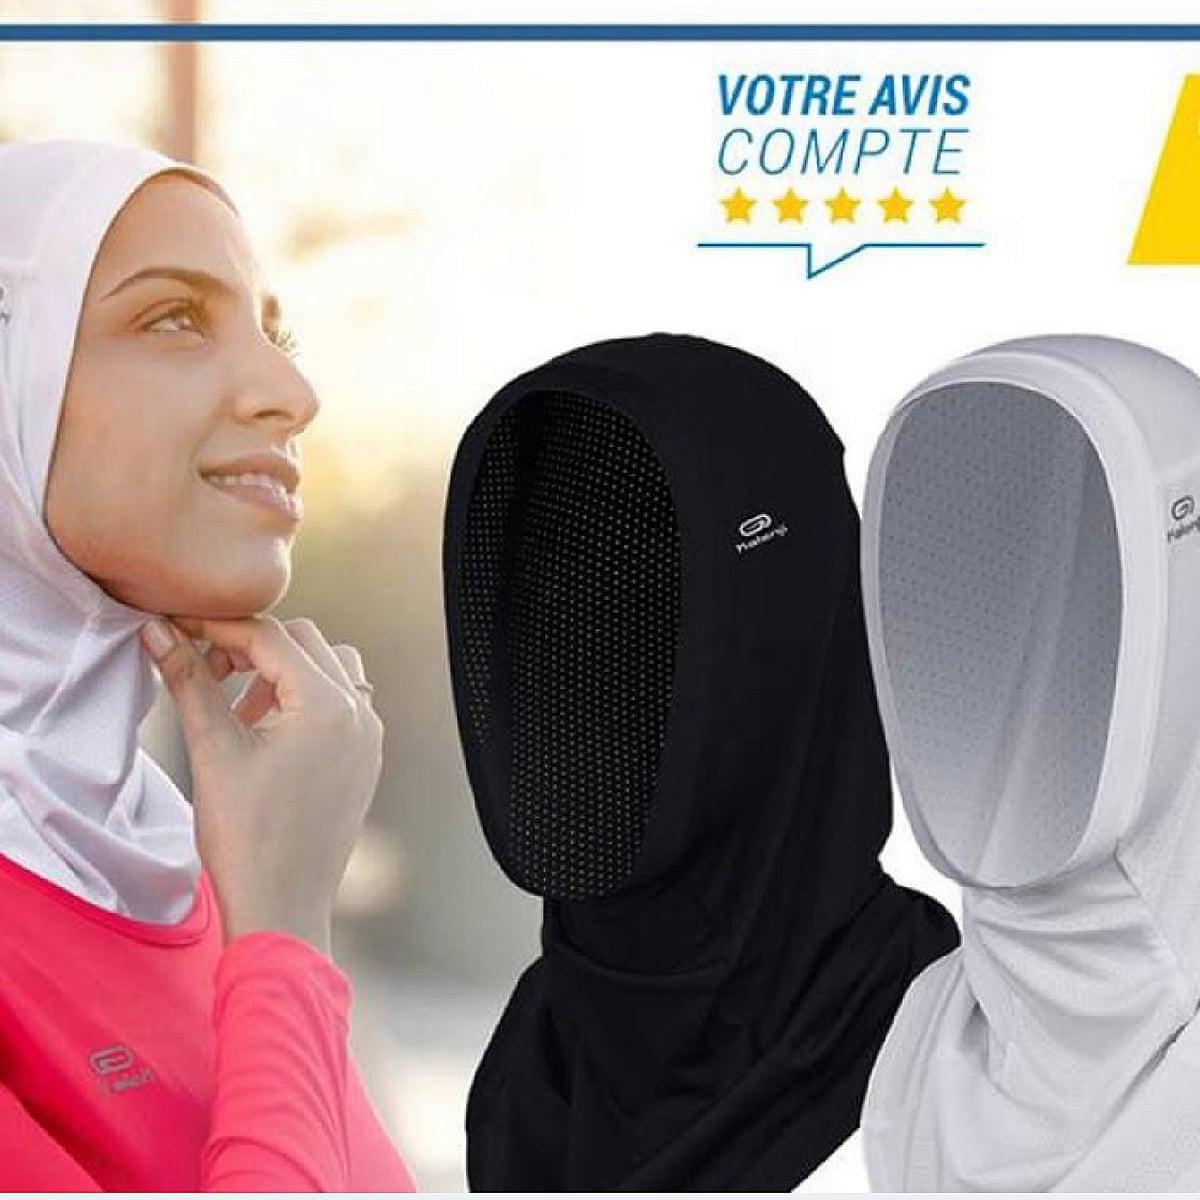 Decathlon Drops French Sports Hijab After Politicians Threaten Boycott France The Guardian